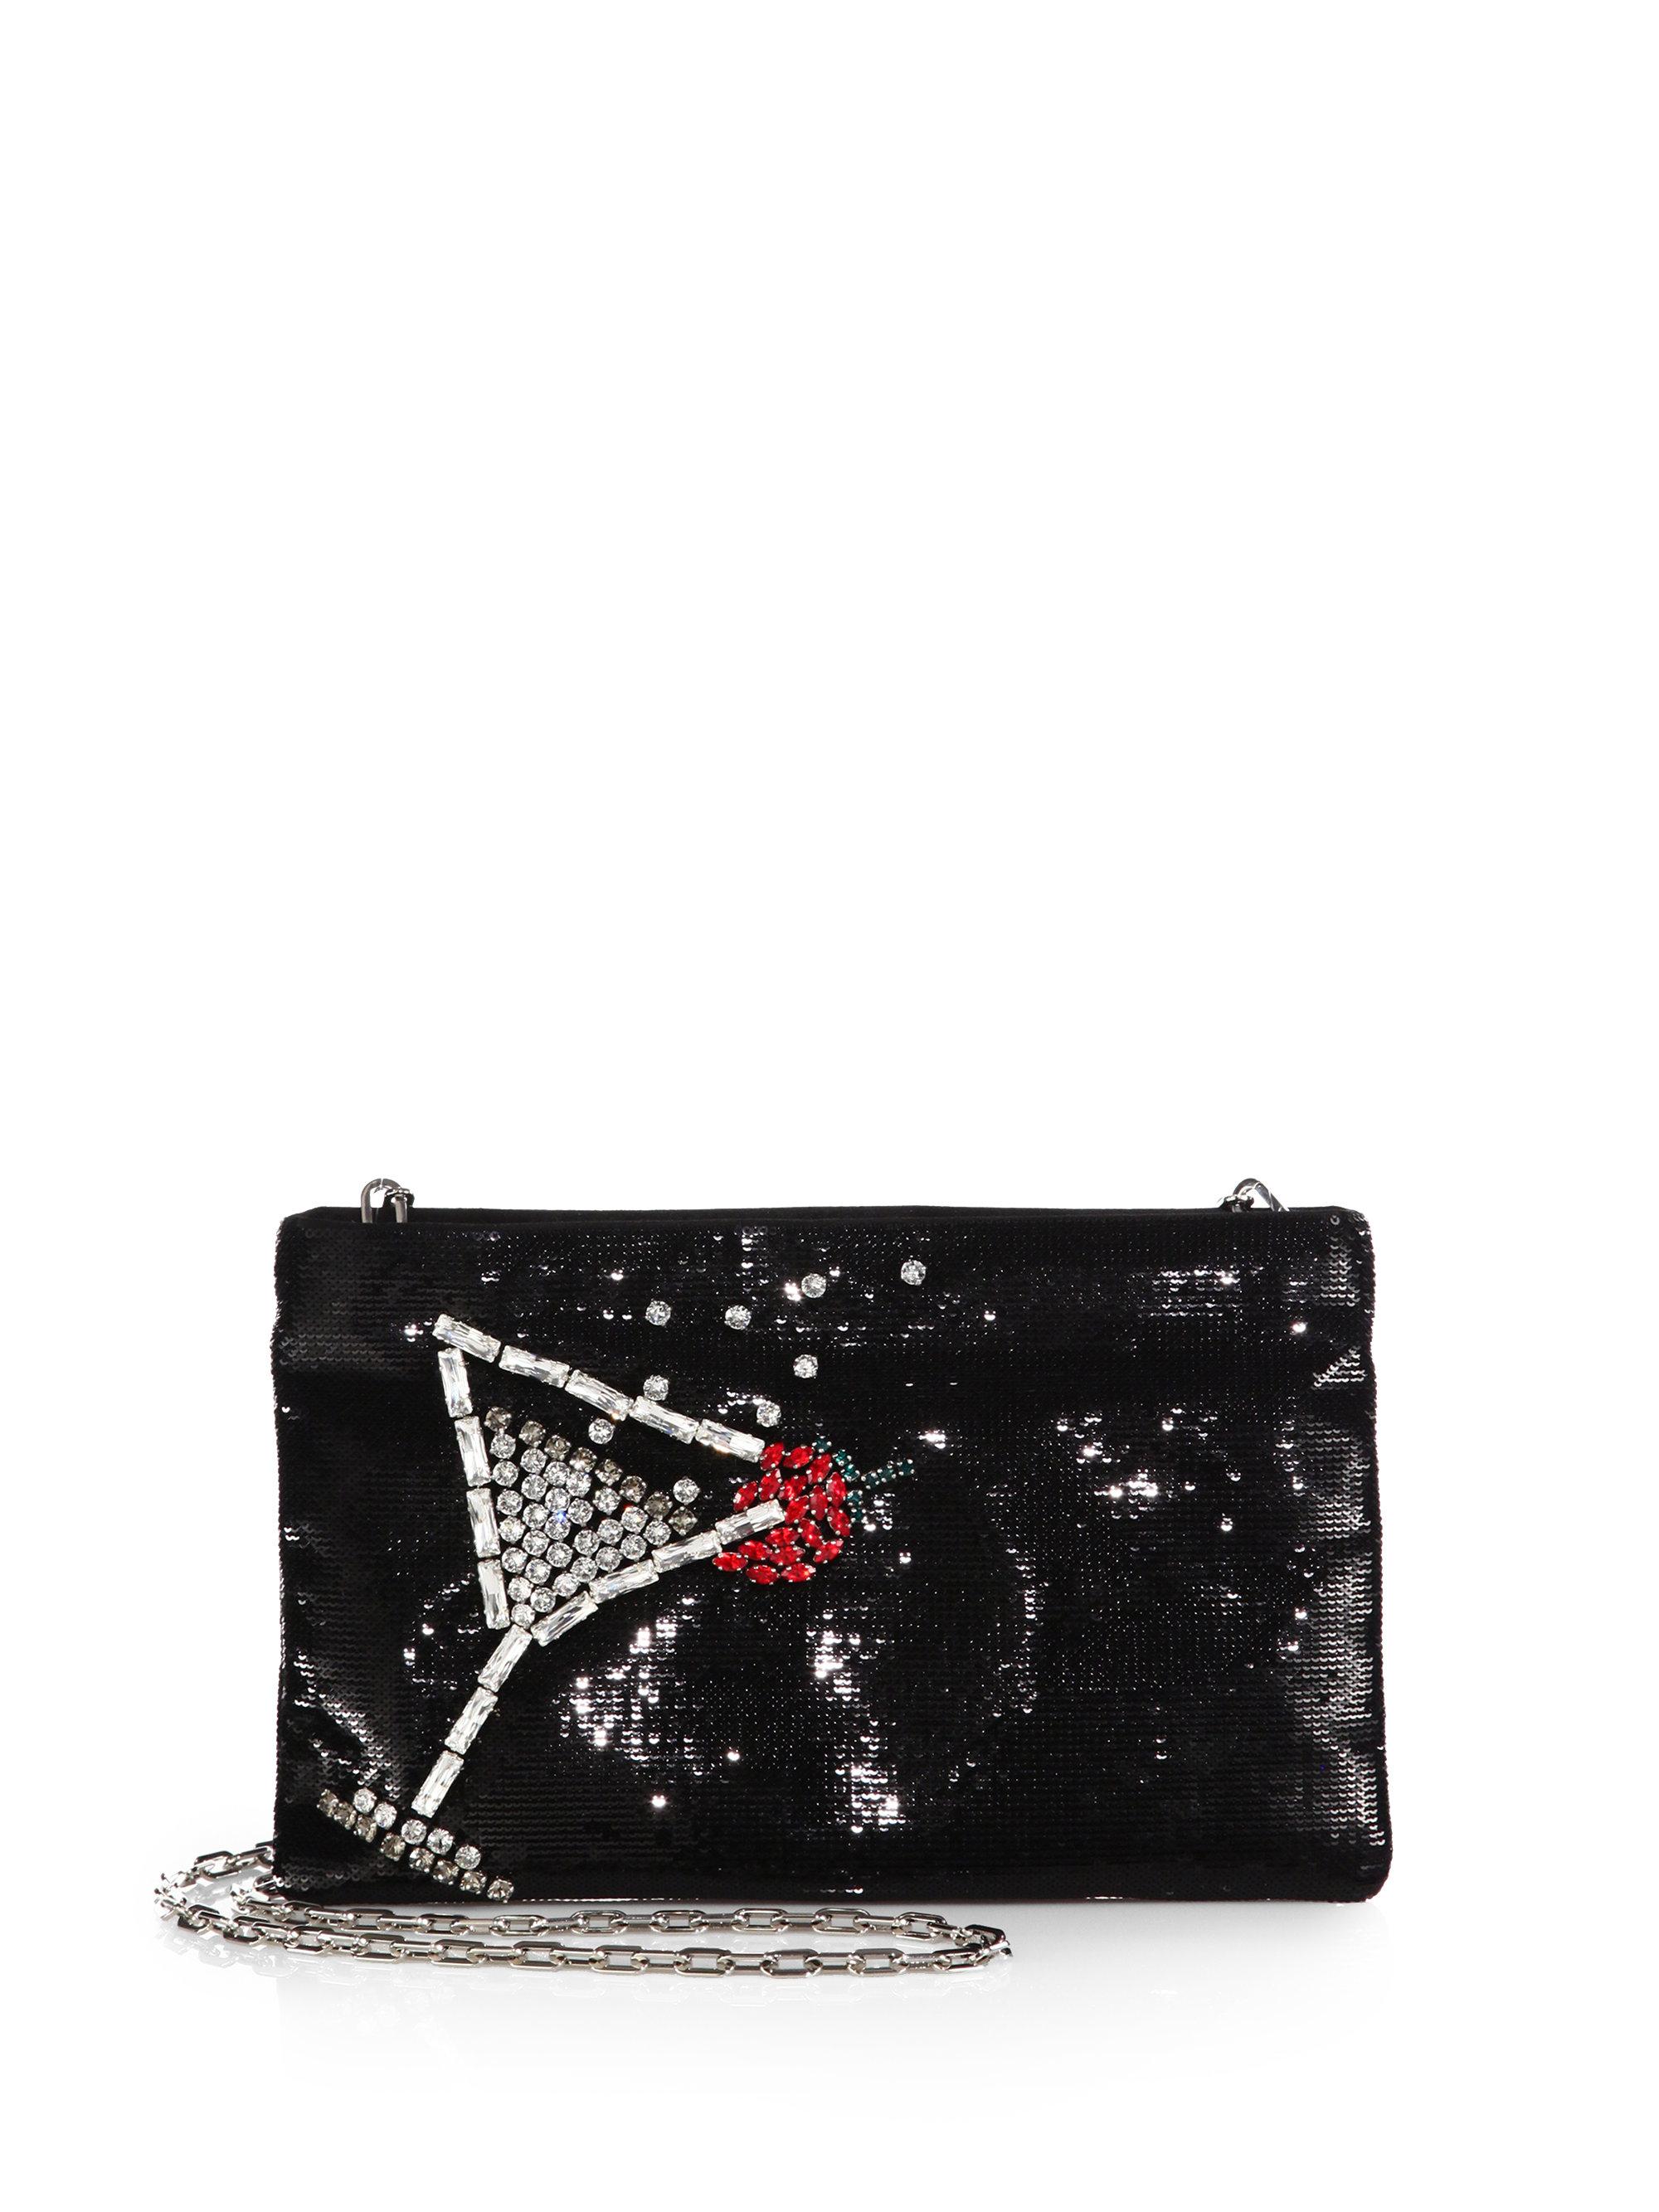 leather prada backpack - Prada Sequin Lips Pochette in Black (BLACK-RED) | Lyst